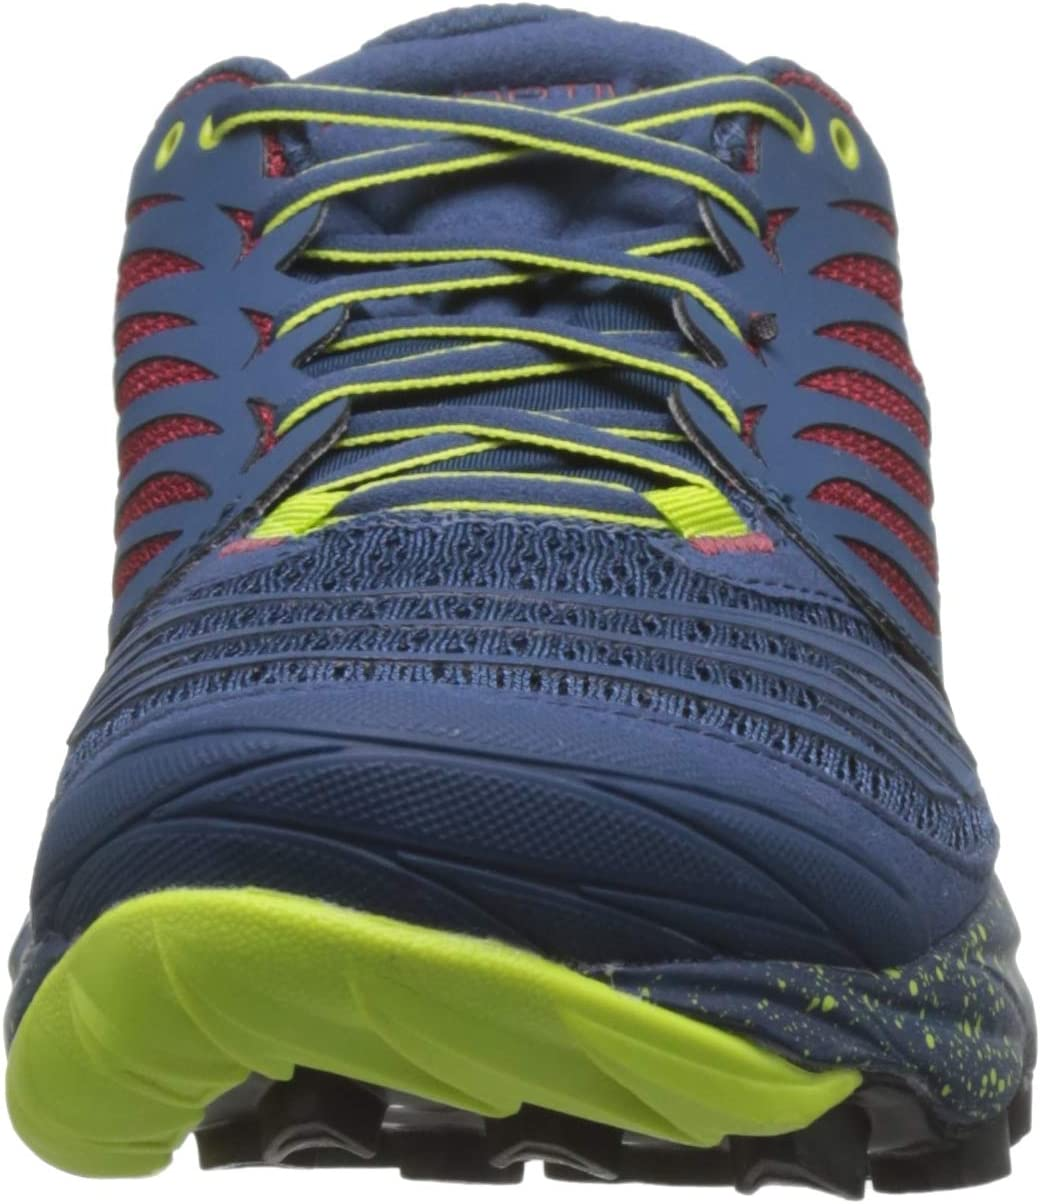 La Sportiva Akasha Chaussures de Trail - Homme Bleu